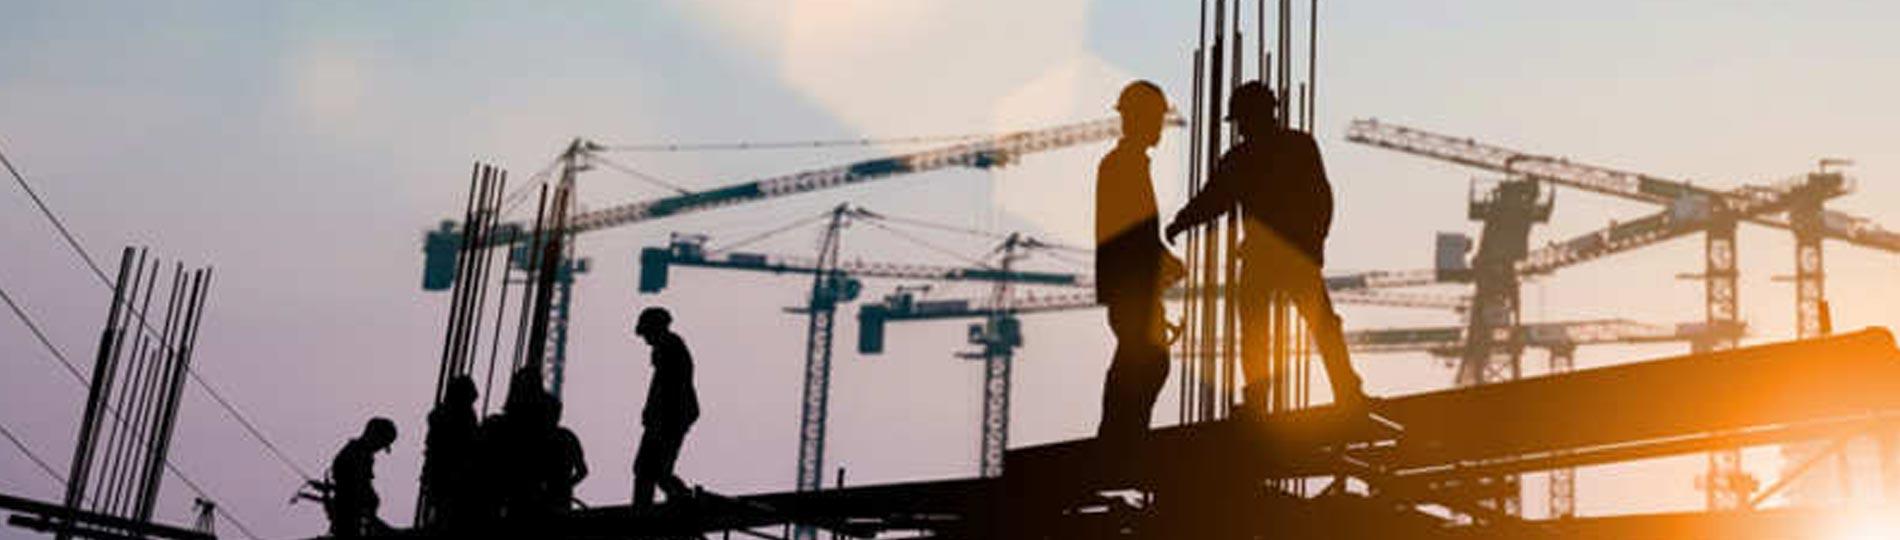 COVID-19: Labour migration to pose short-term challenges for power, renewable energy sectors